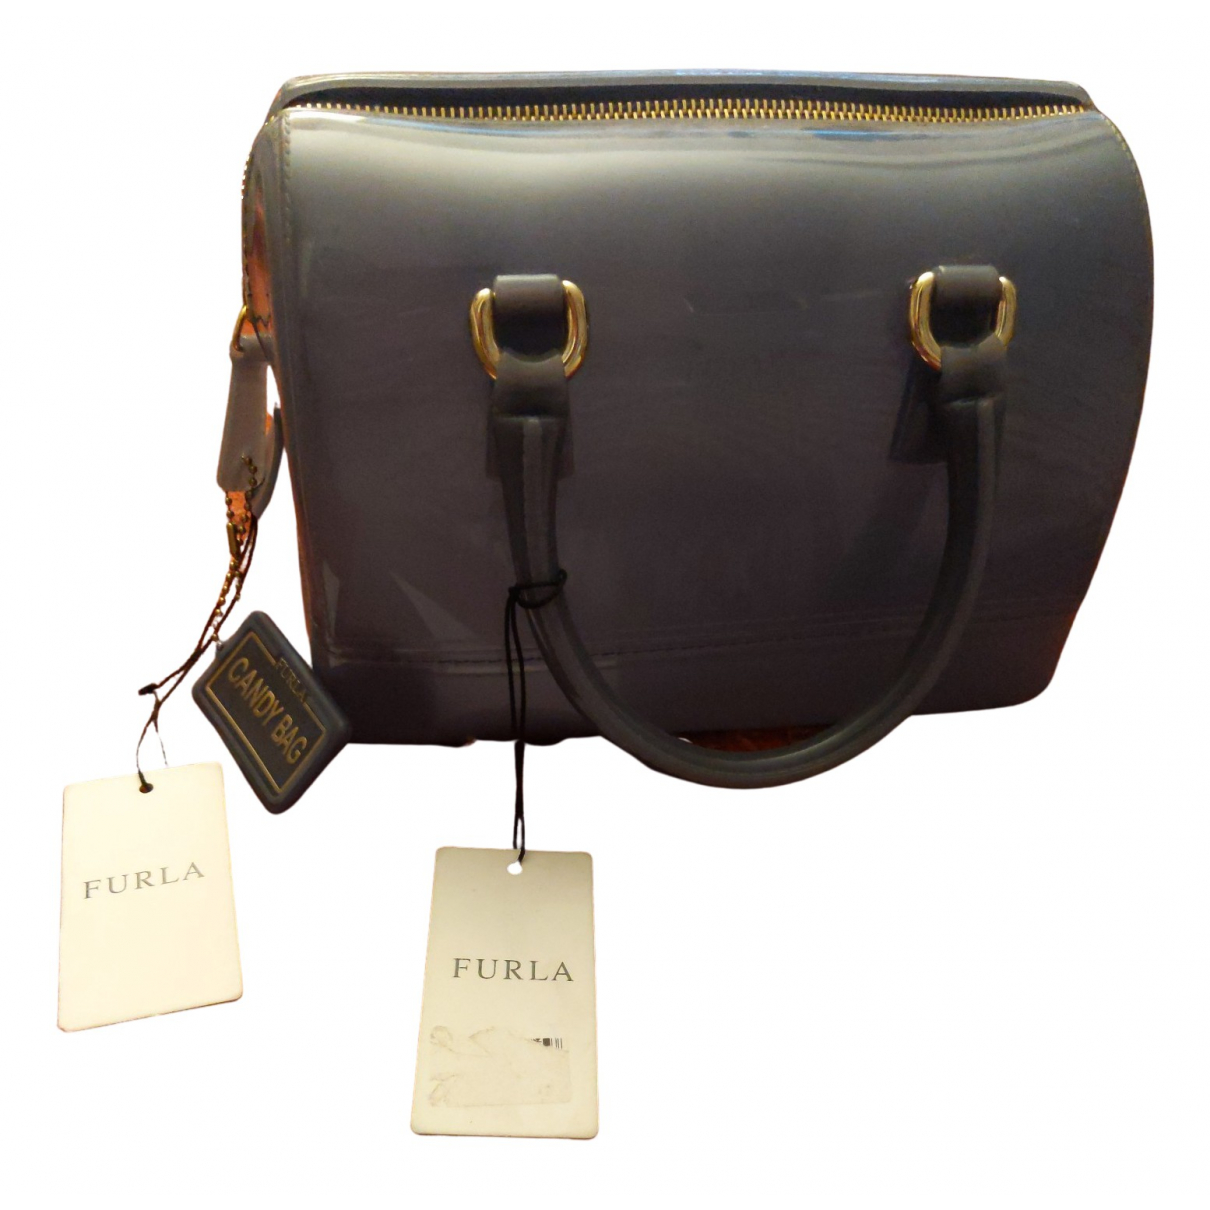 Furla - Sac a main Candy Bag pour femme - bleu